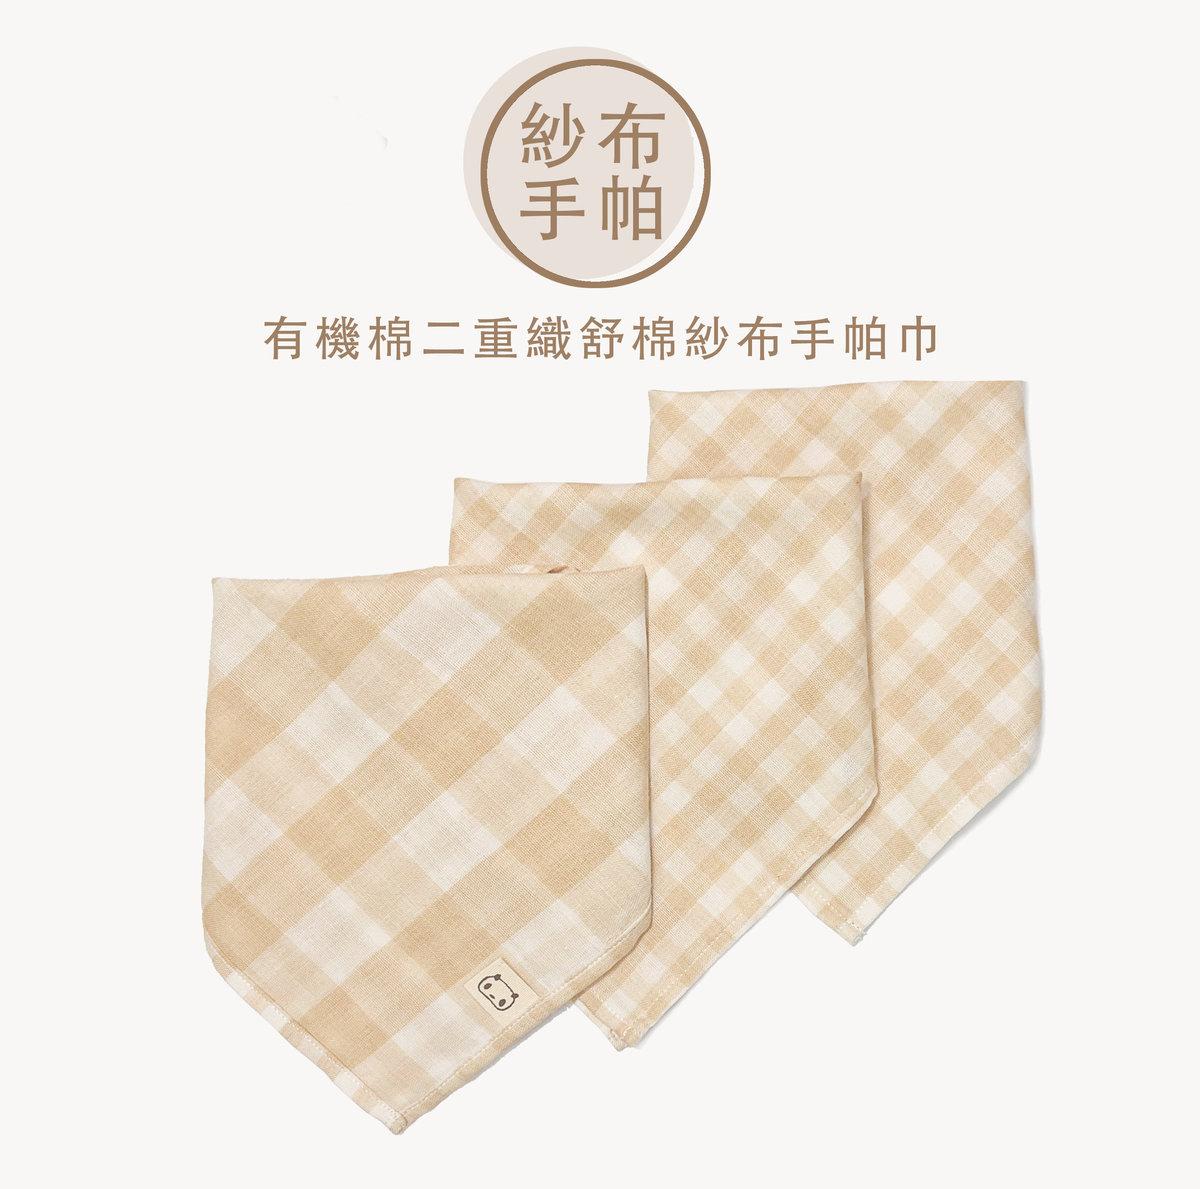 Organic Cotton Baby 2 ply muslin handkerchief (25 x 25cm x 3 pieces)